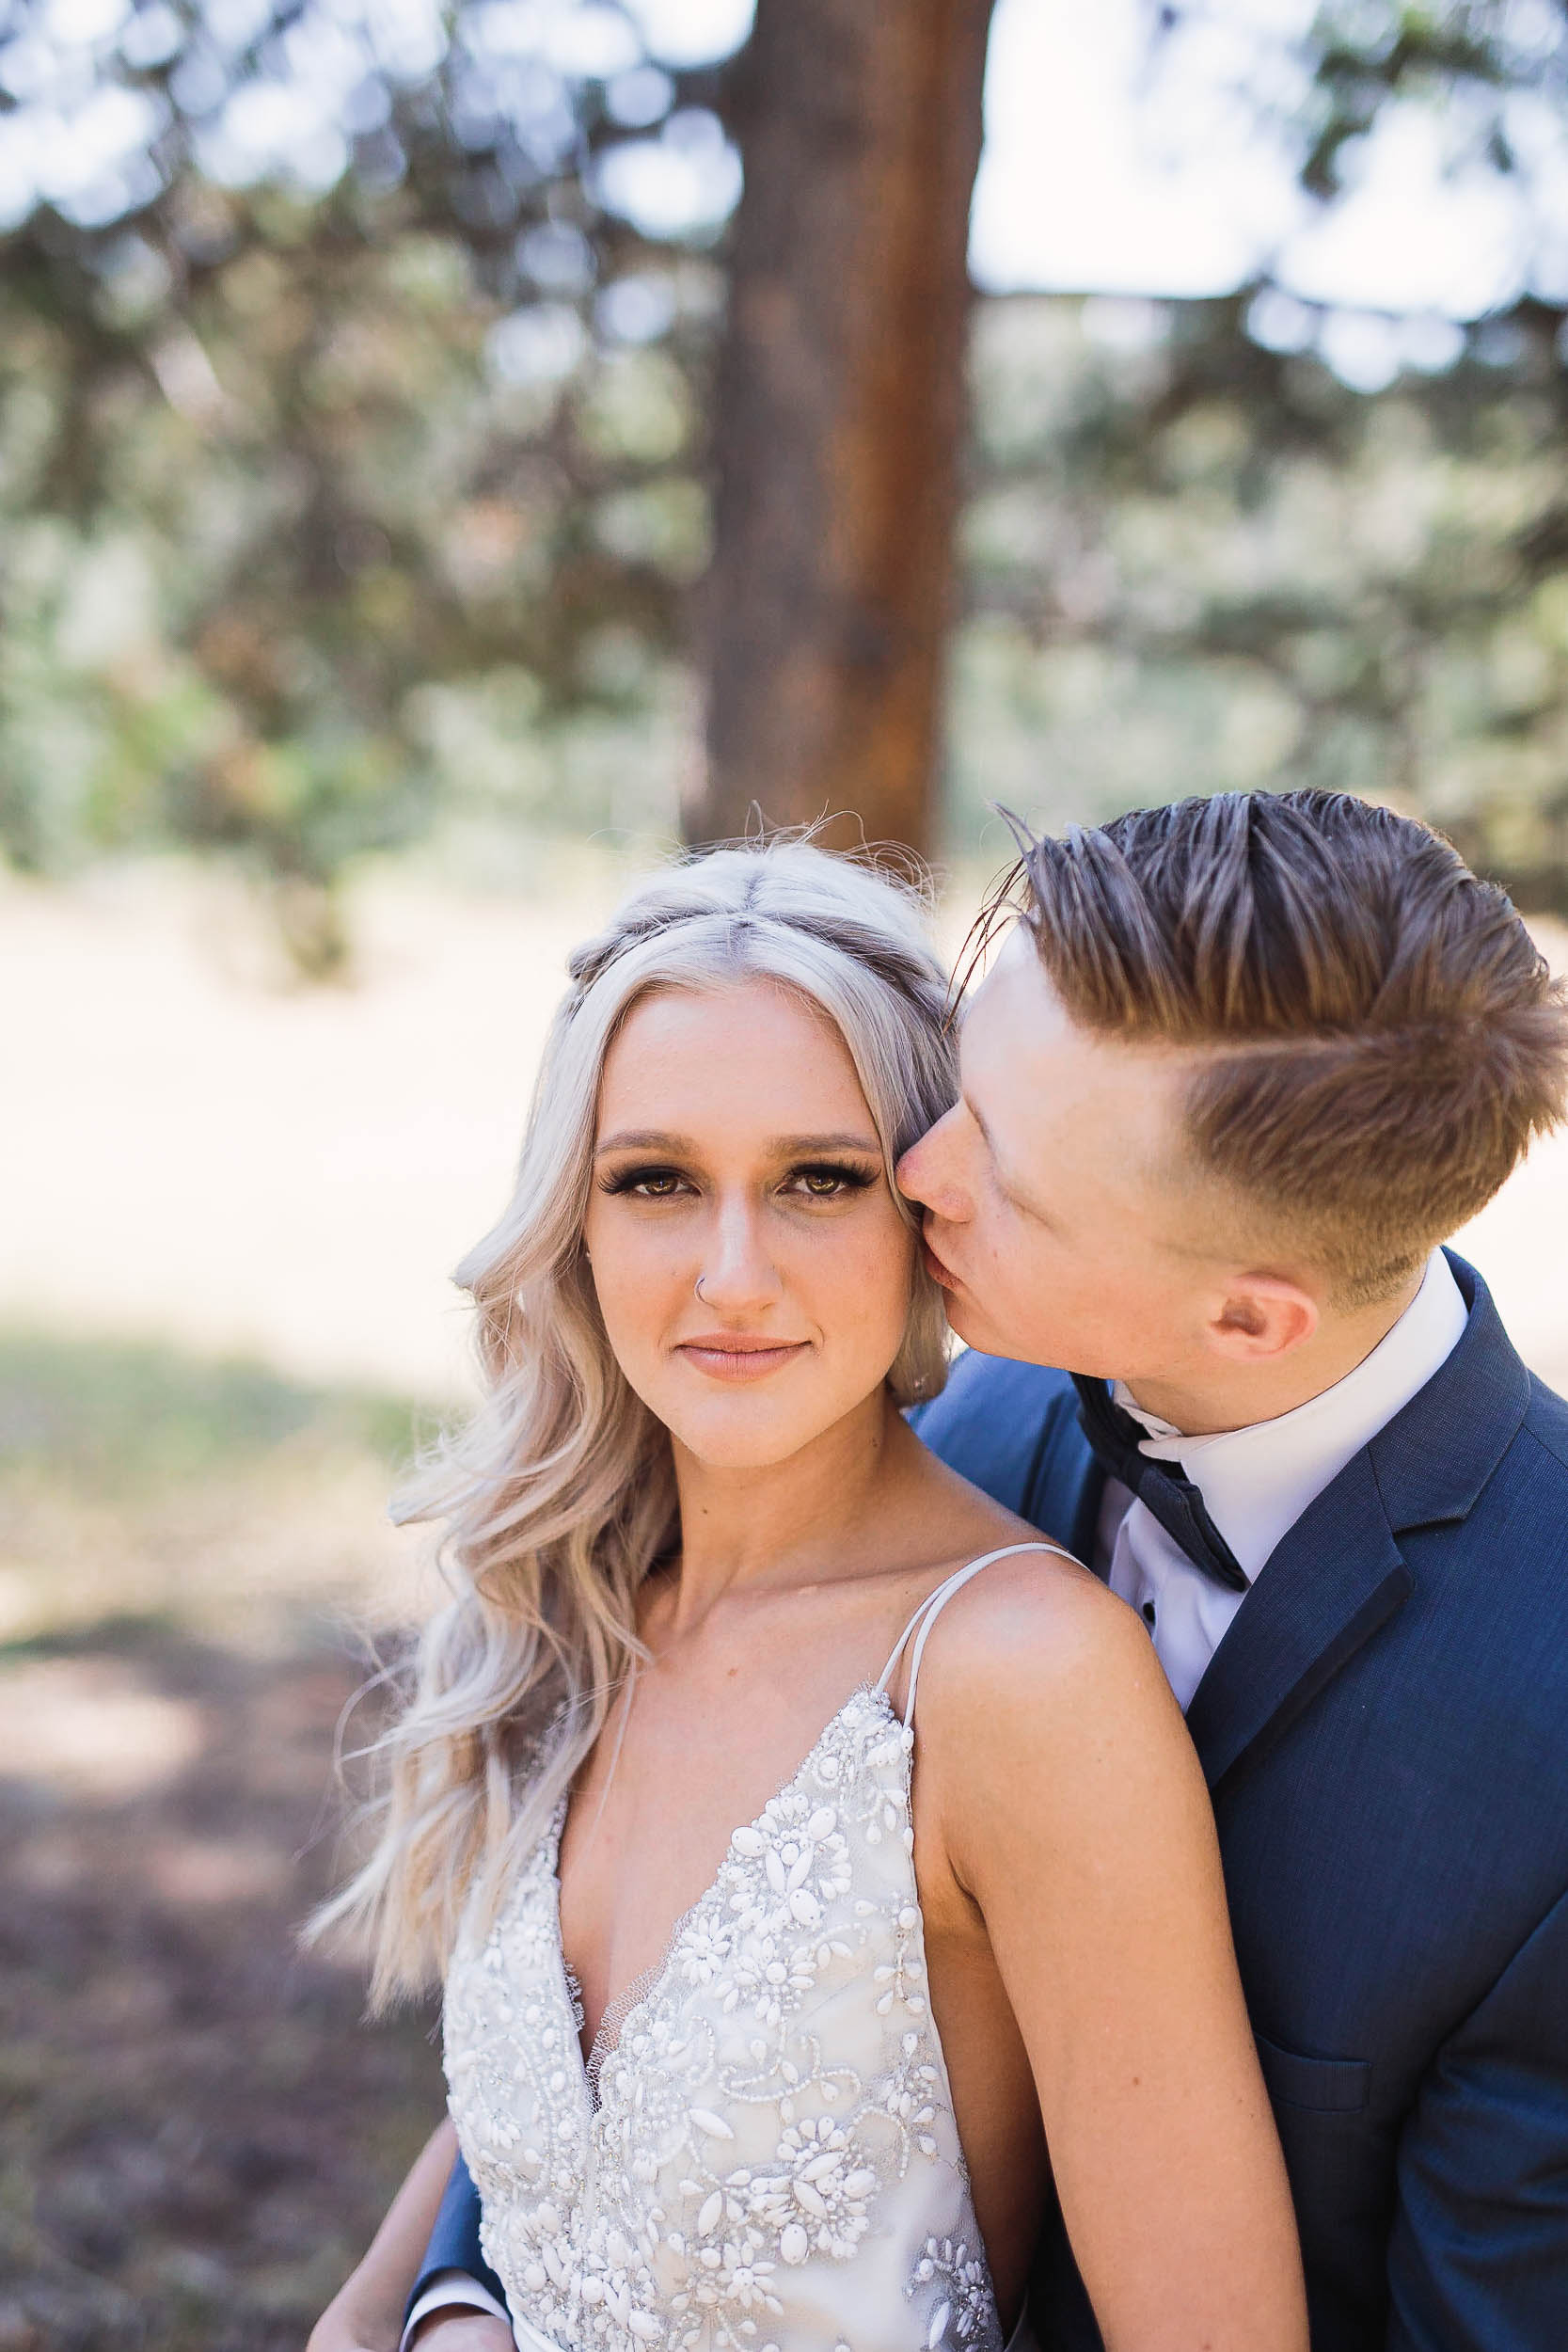 Stunning bride and groom wedding day portraits